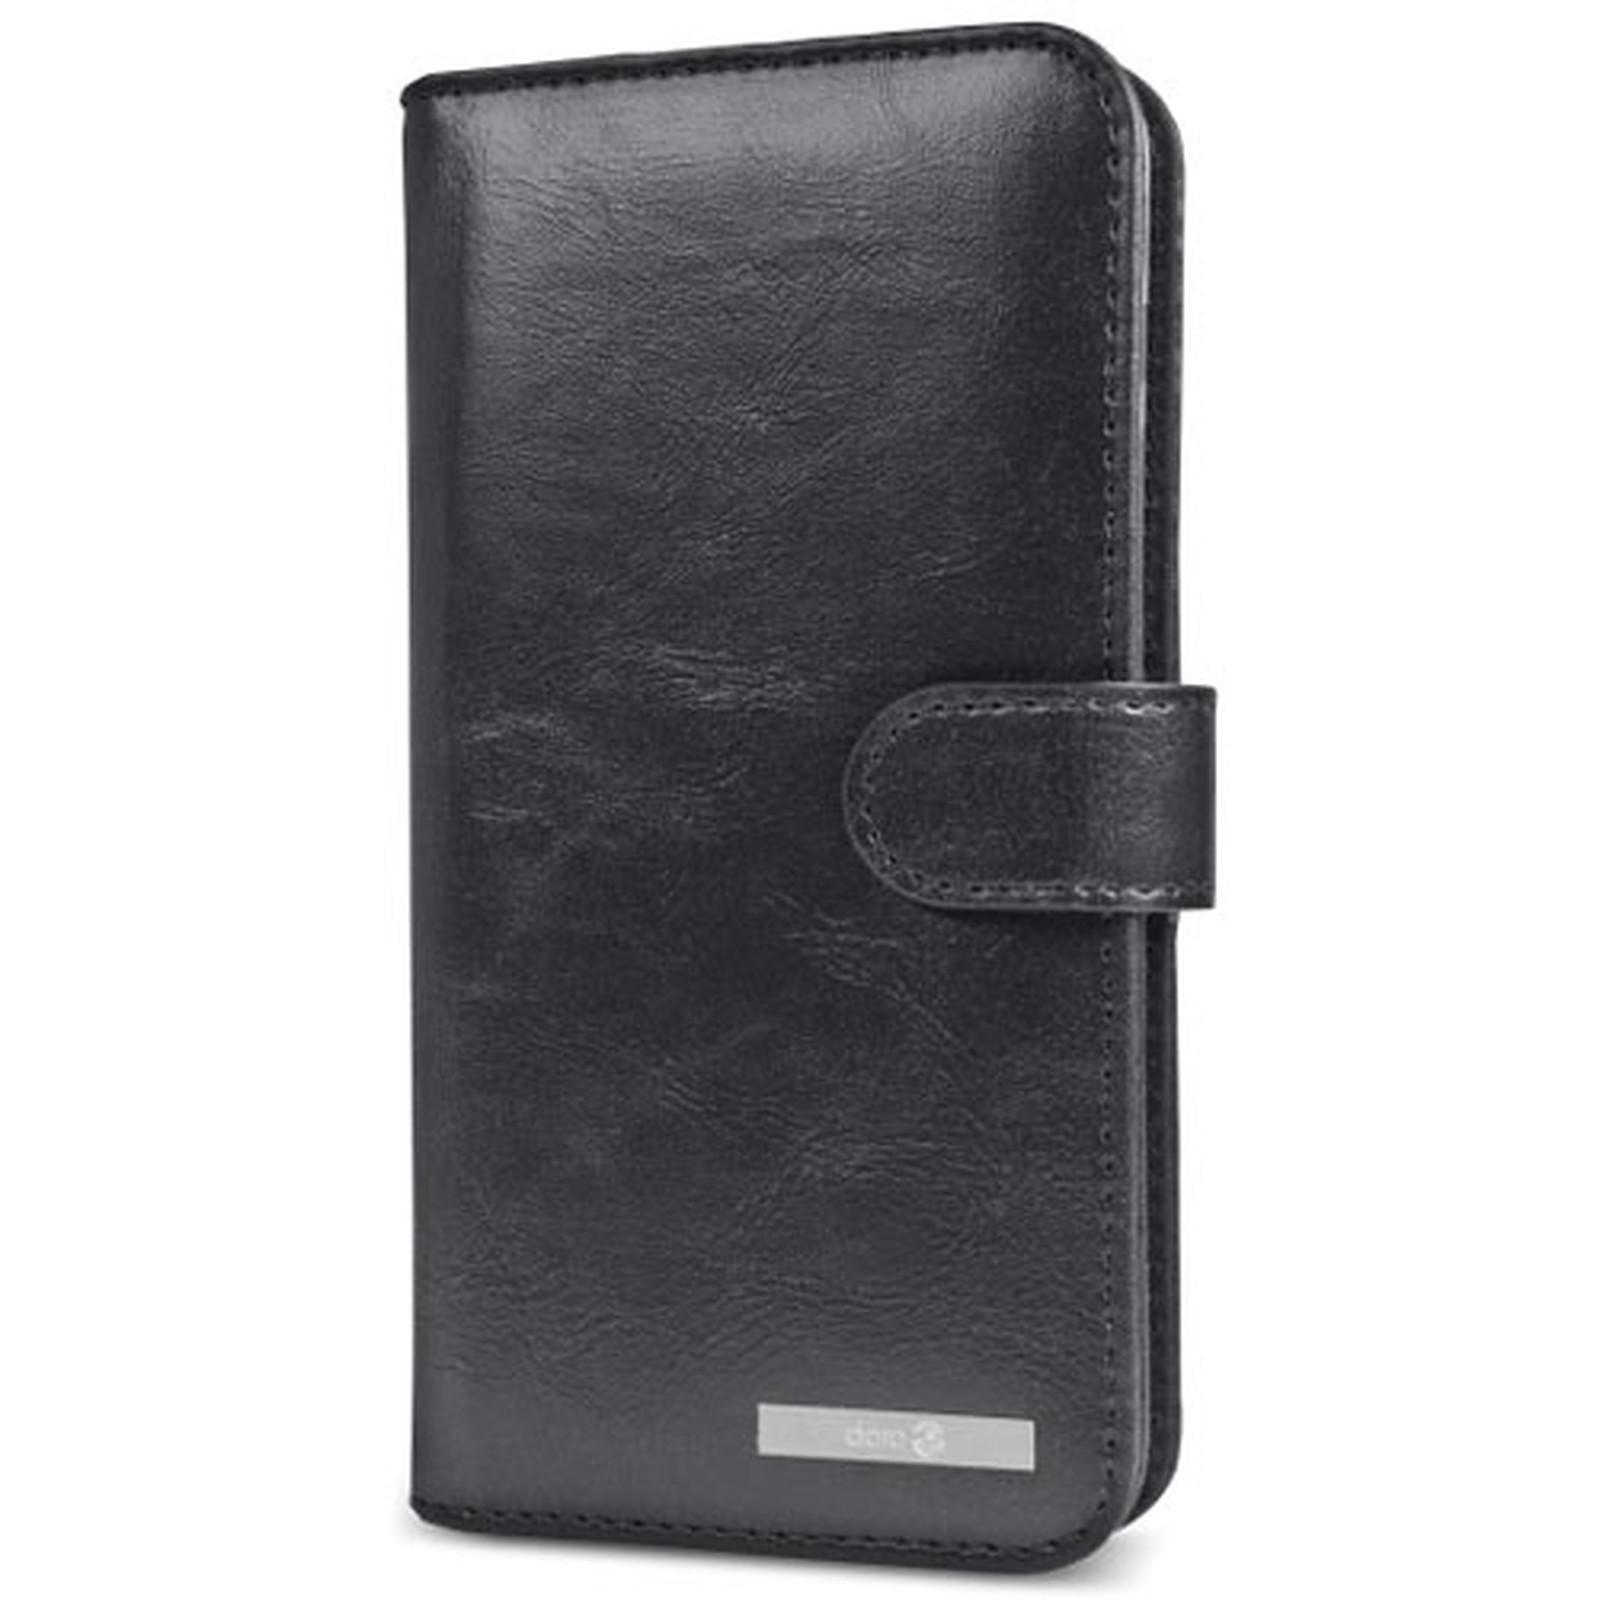 Doro Wallet Case Noir 8040